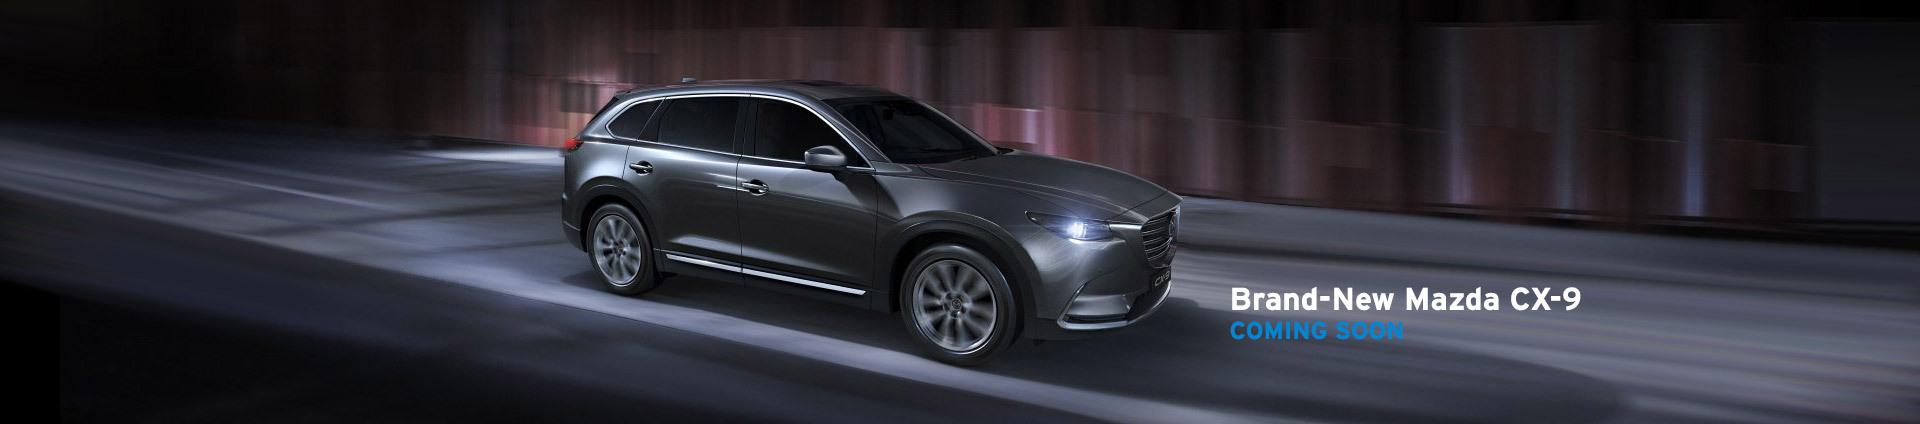 Brand-New Mazda CX9